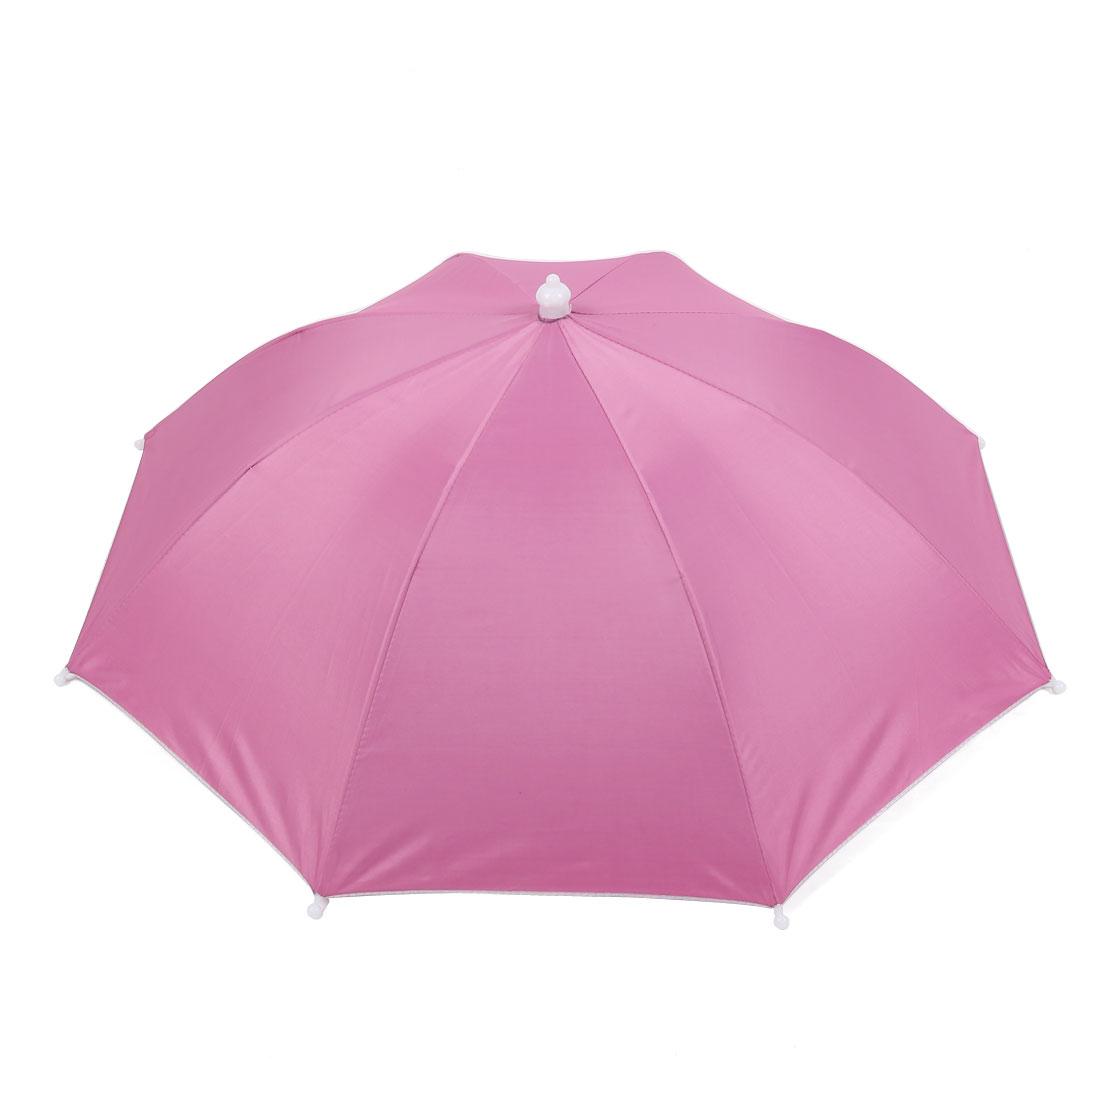 Outdoor Sports Game Fishing Umbrella Hat Headwear Fushsia